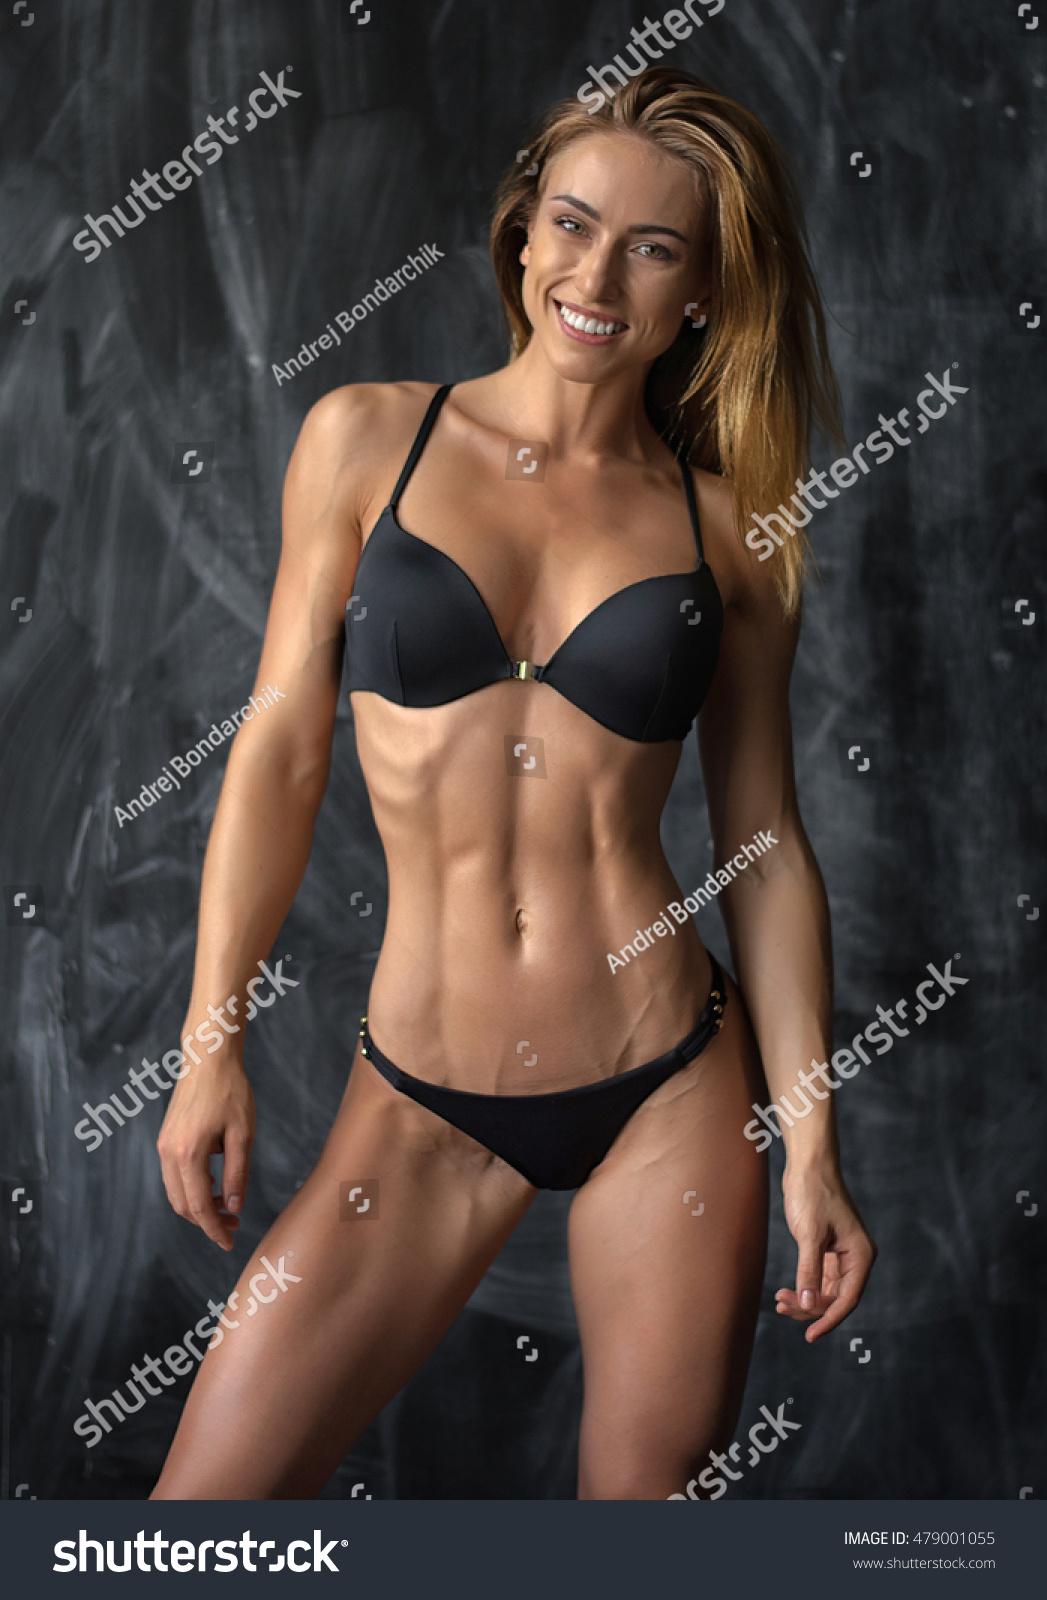 athletic women Nude erotic